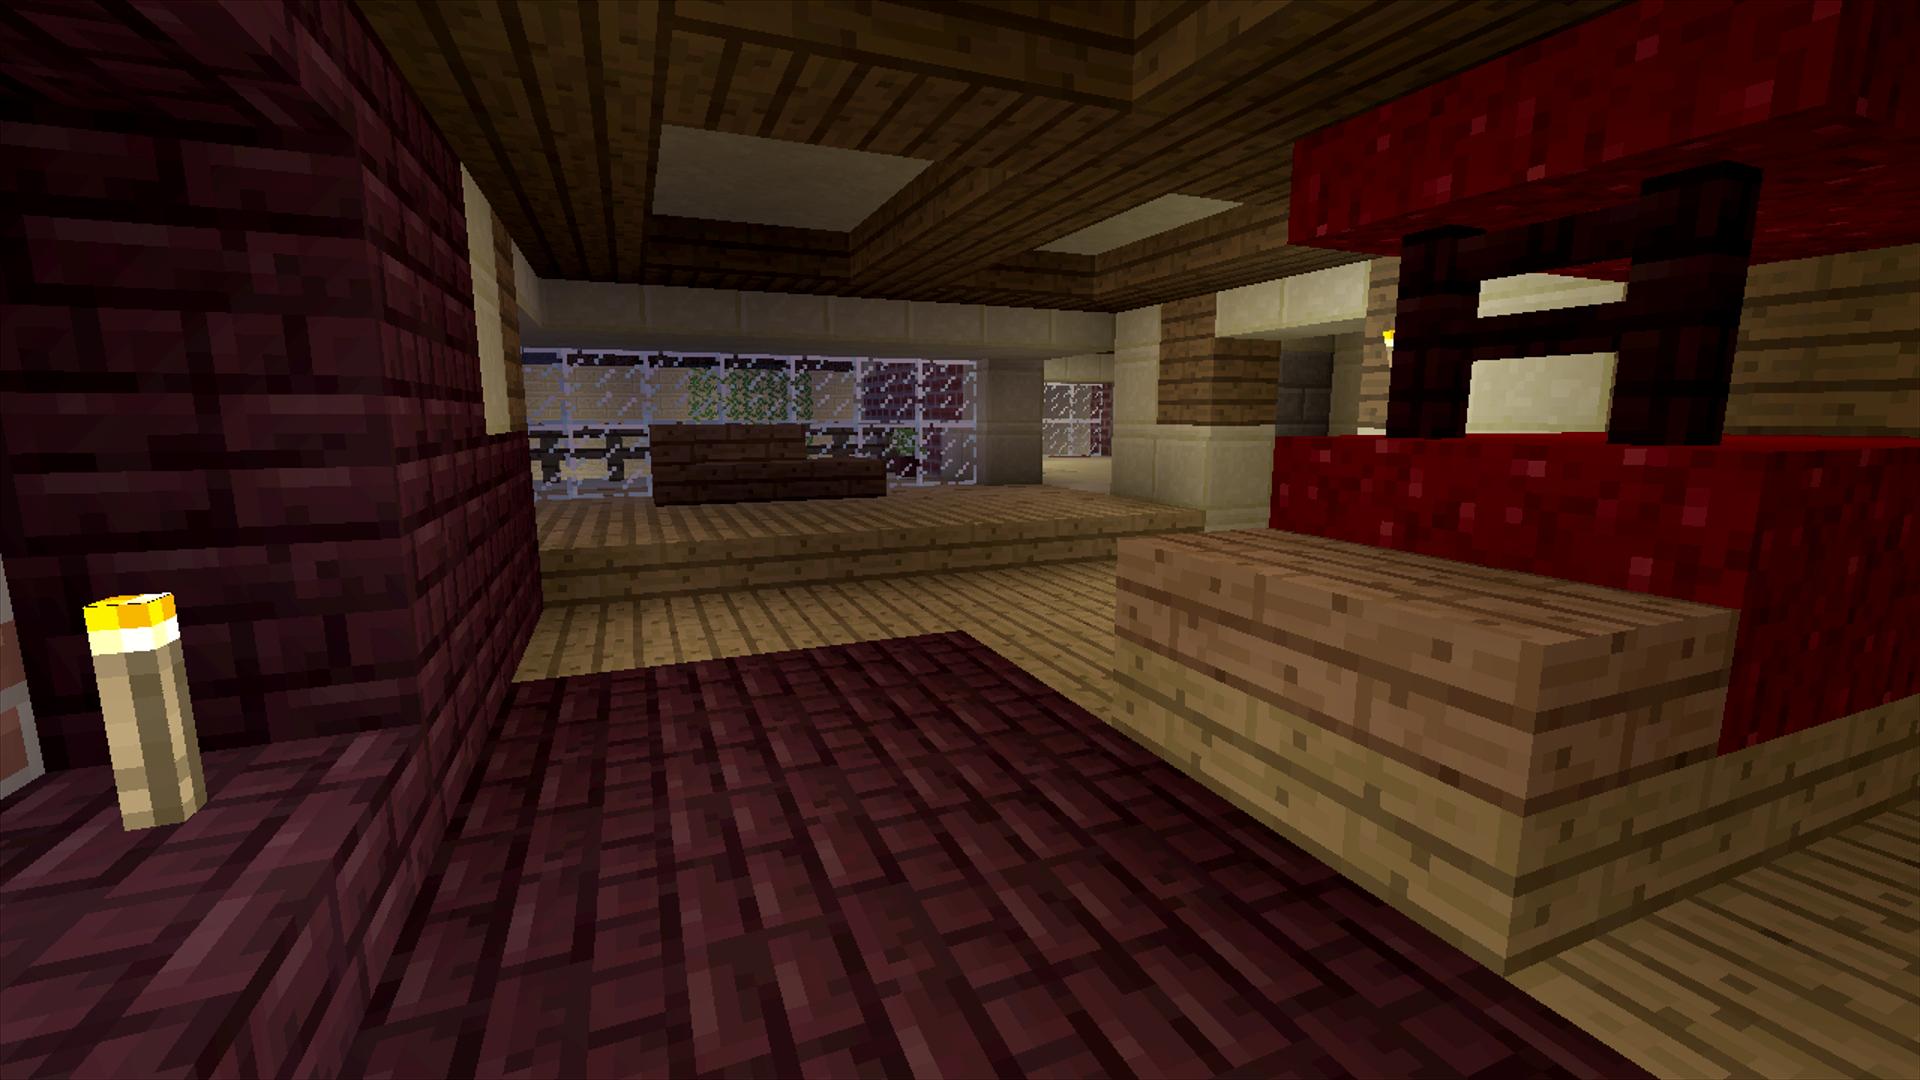 Minecraft Screen Shot 2-16-19, 1.27 PM.png